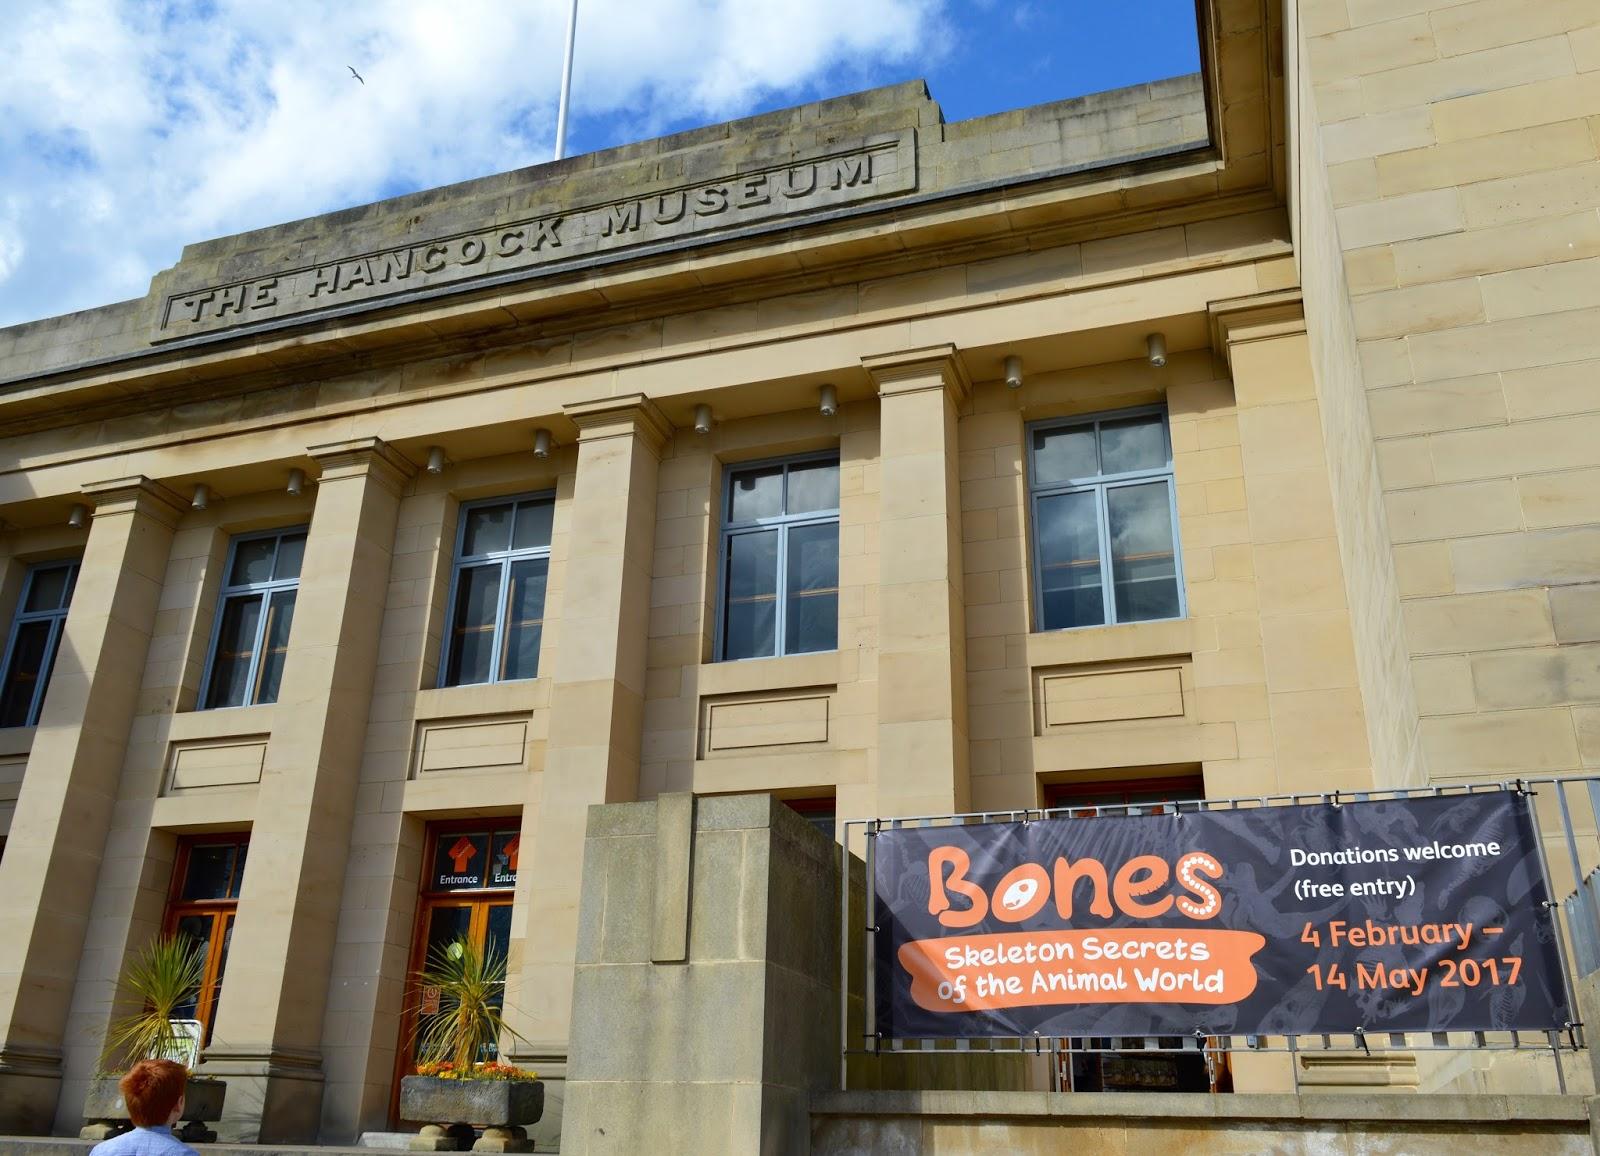 Bones Exhibition at Hancock Museum, Newcastle | Exterior